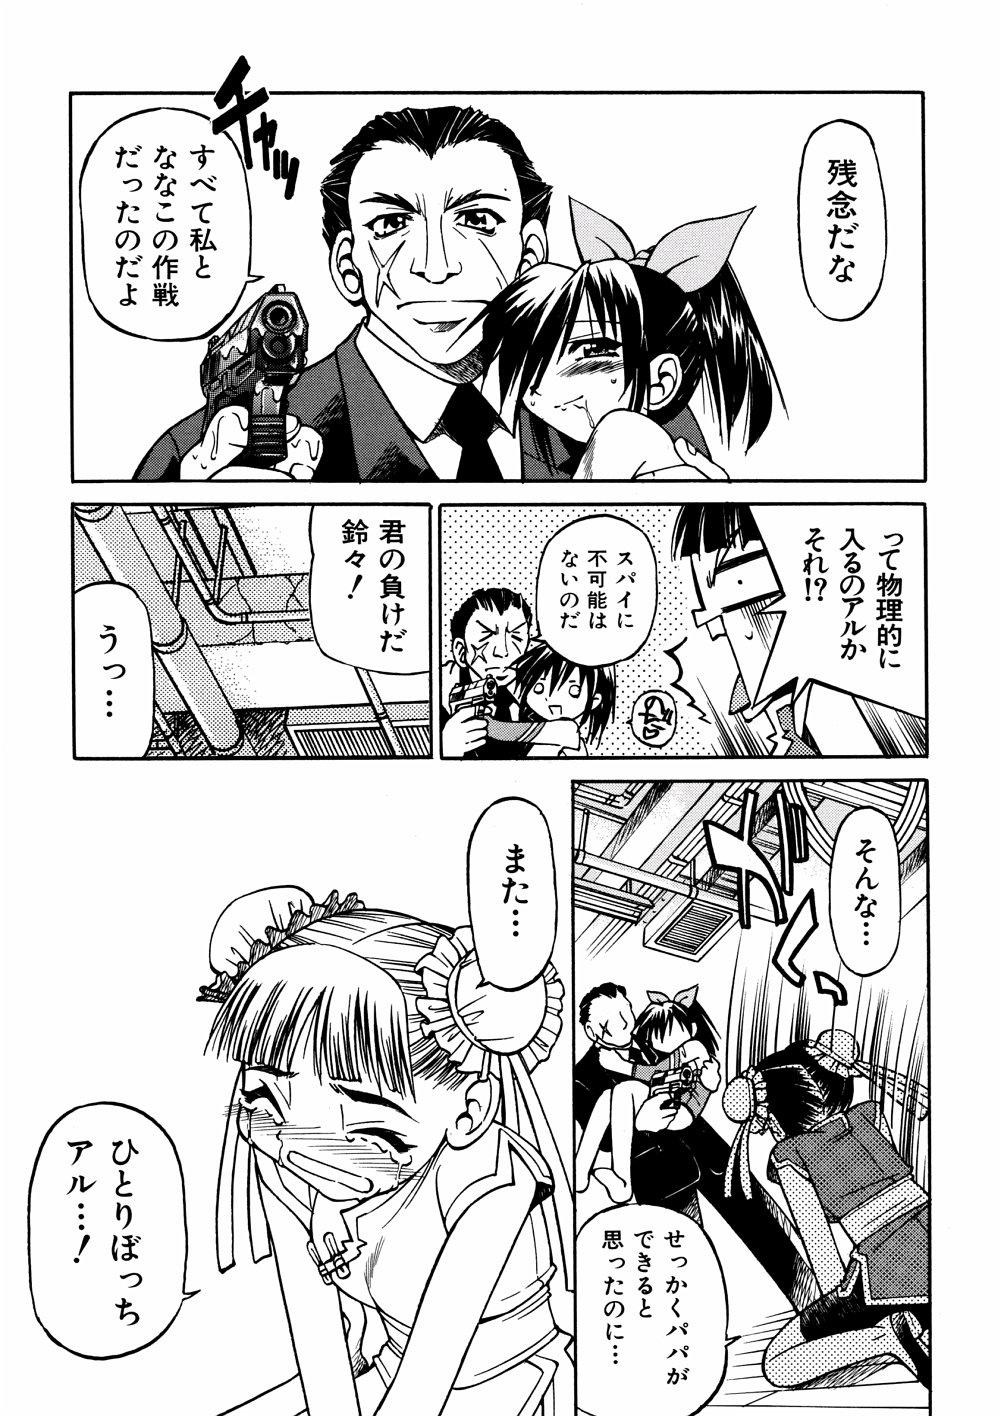 00 Nanako - Agent Nanako 79